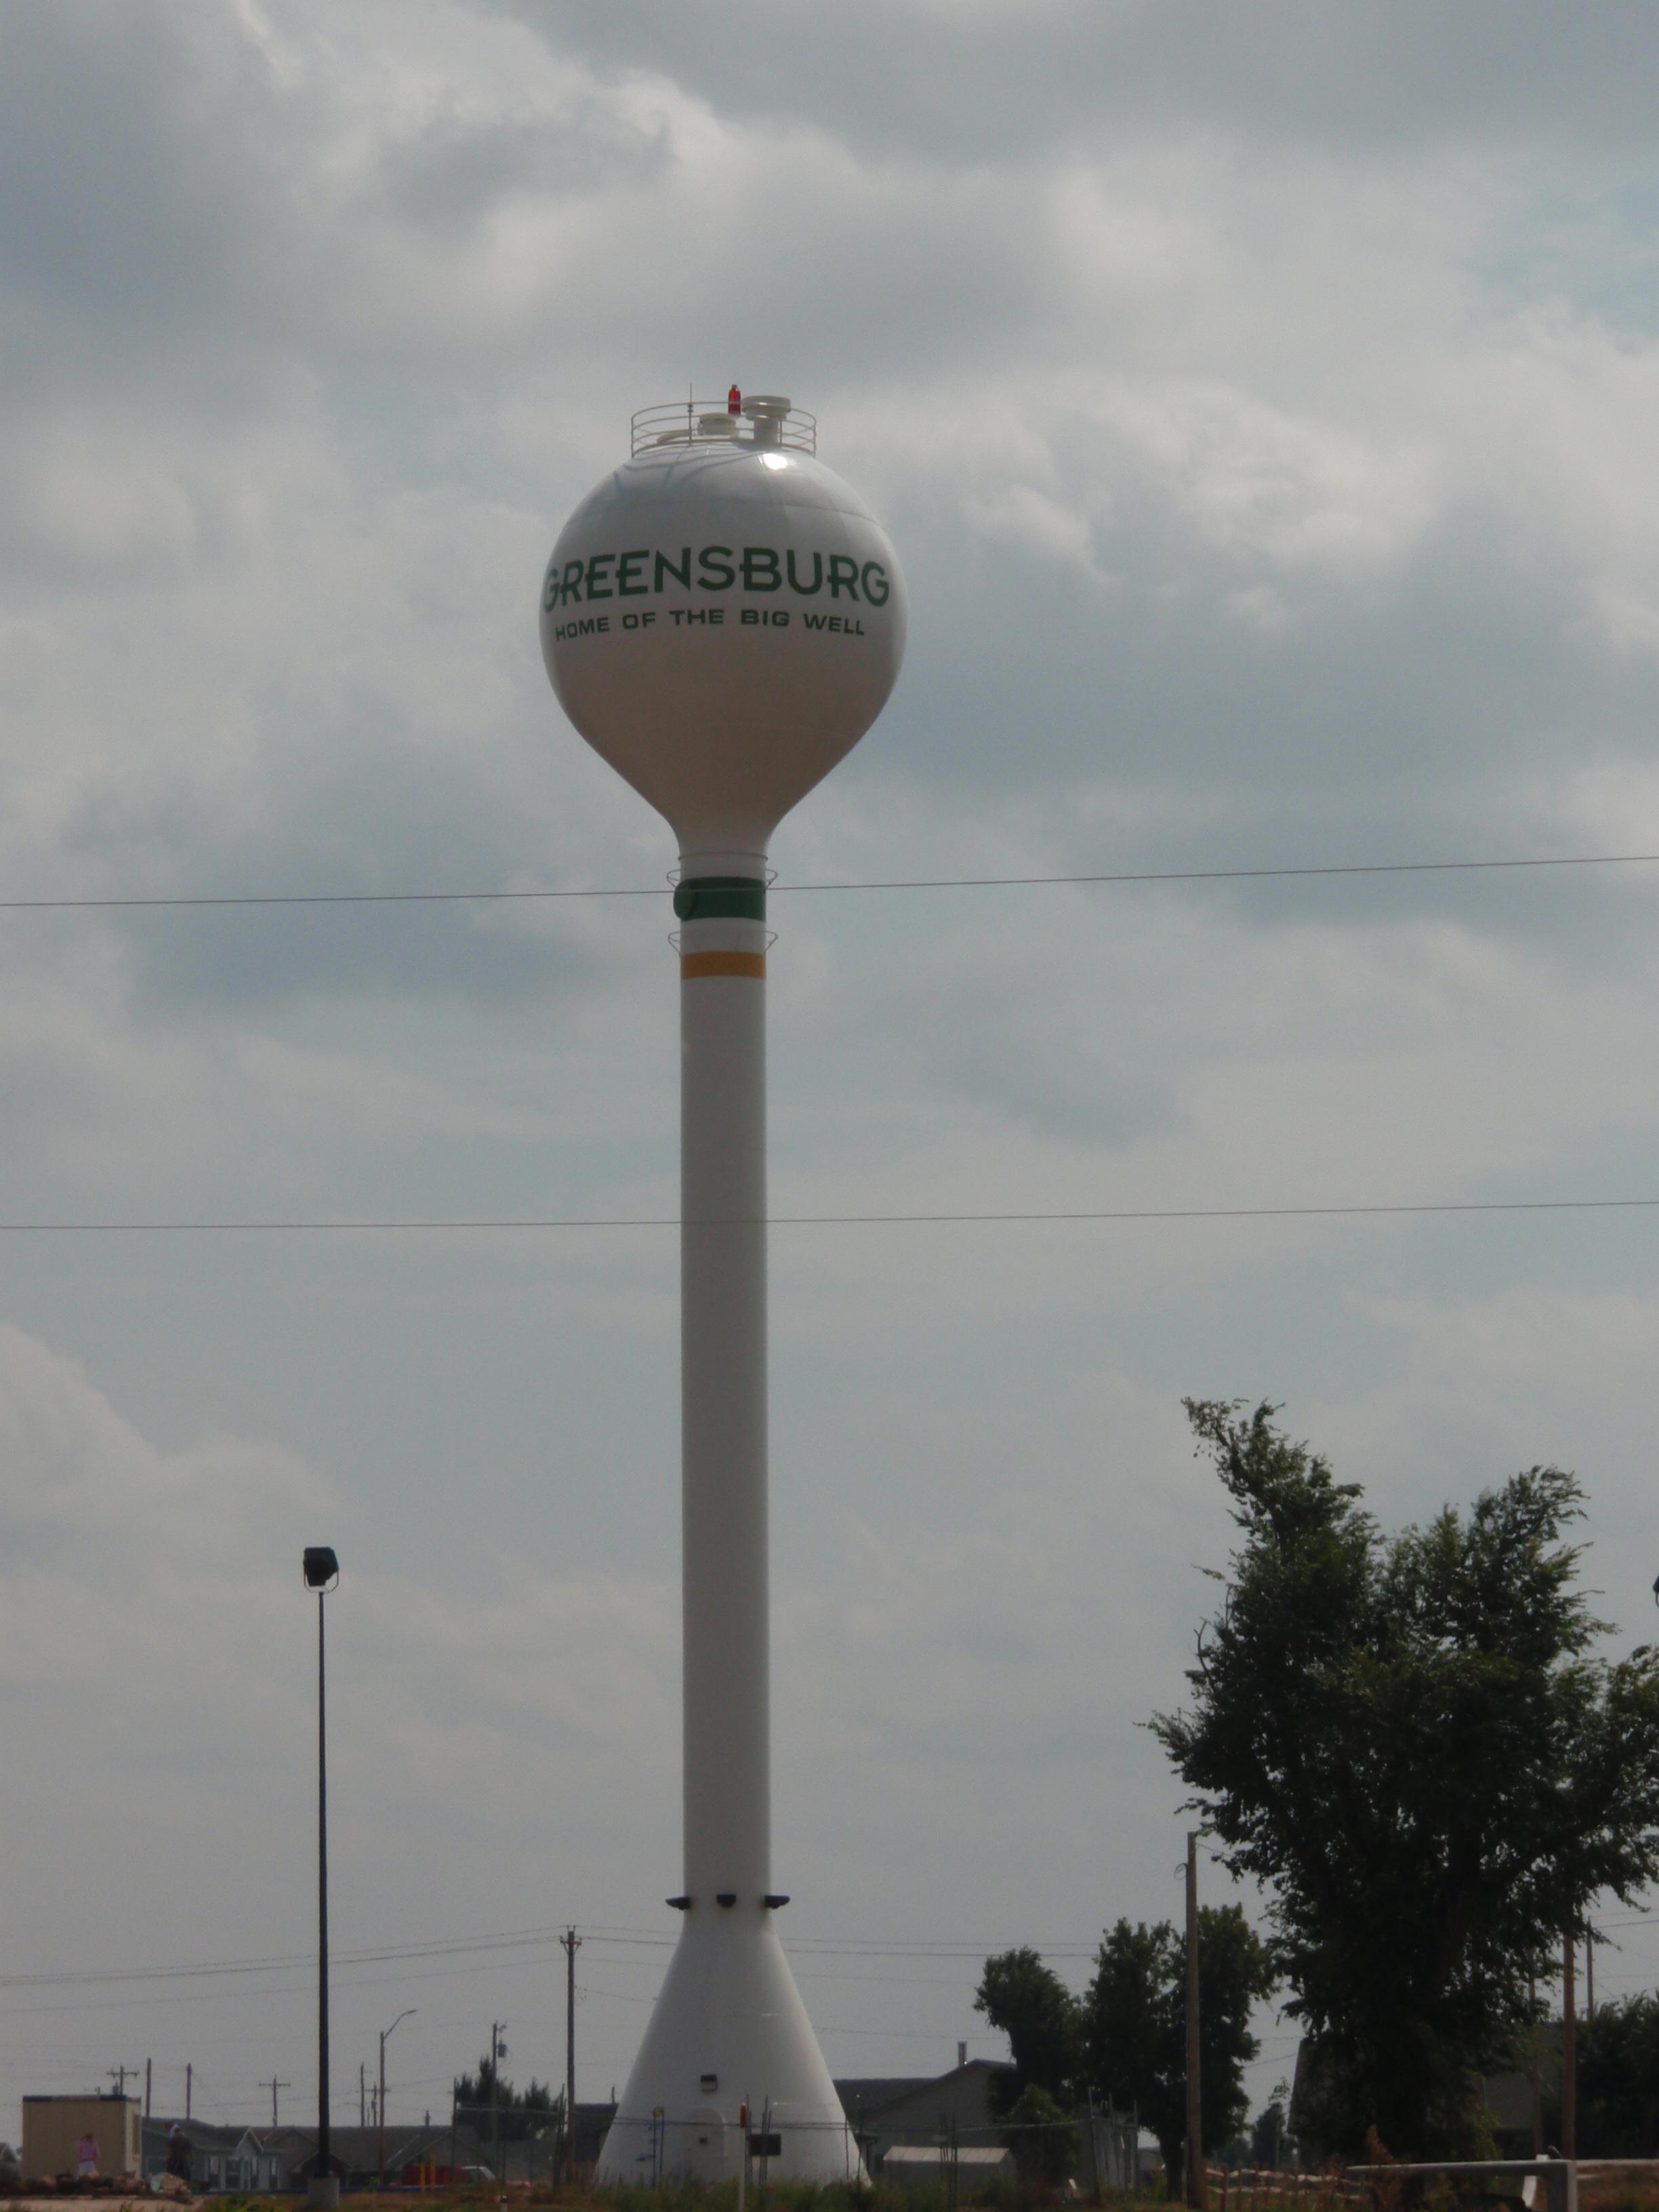 Greensburg (Kansas)